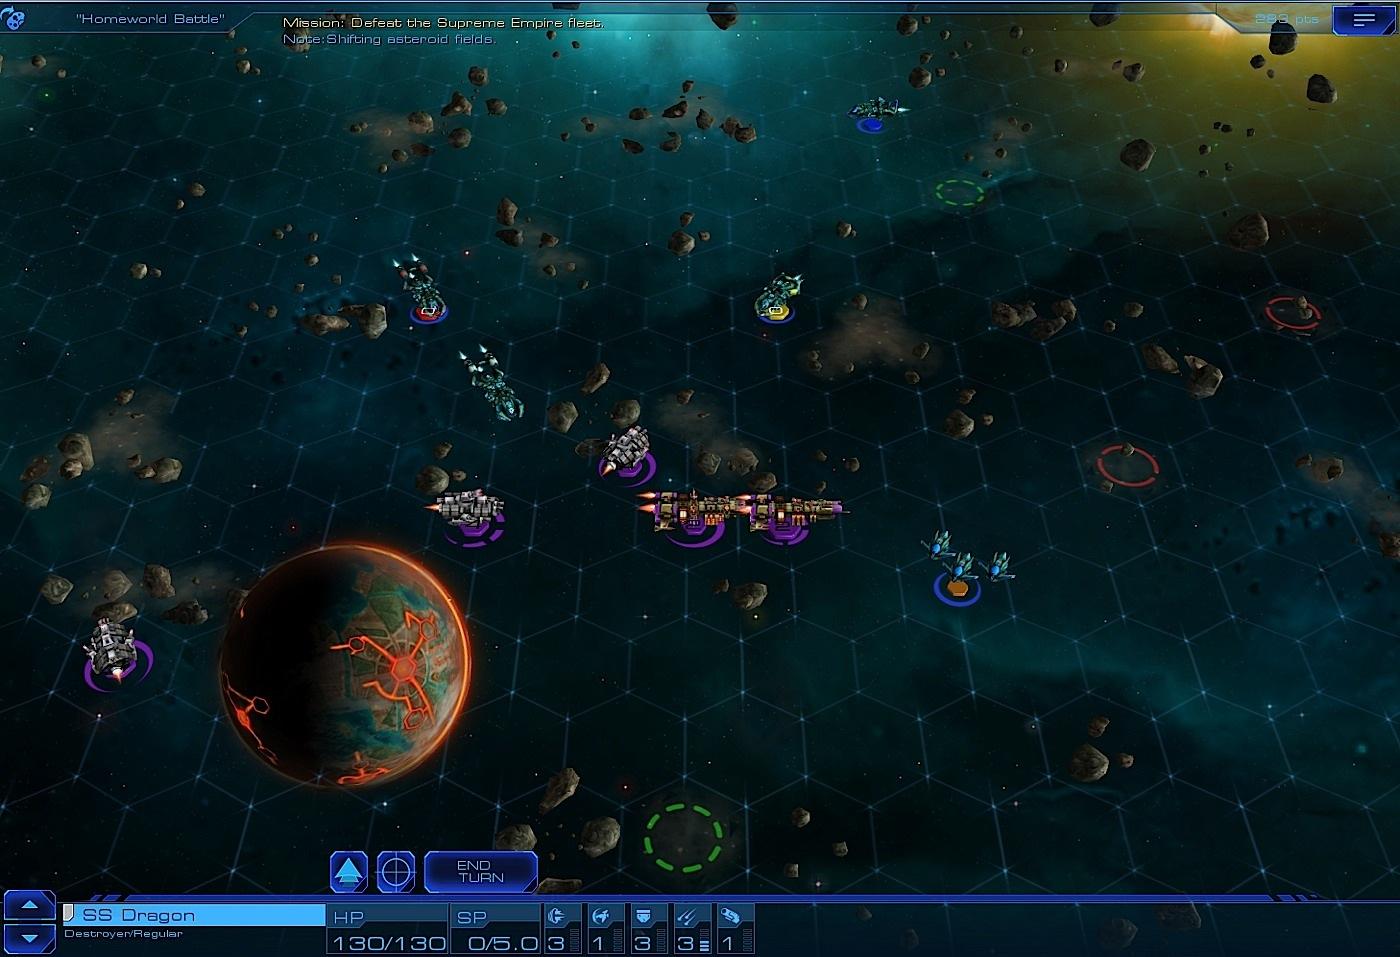 Sid Meier's Starships combat screenshot.